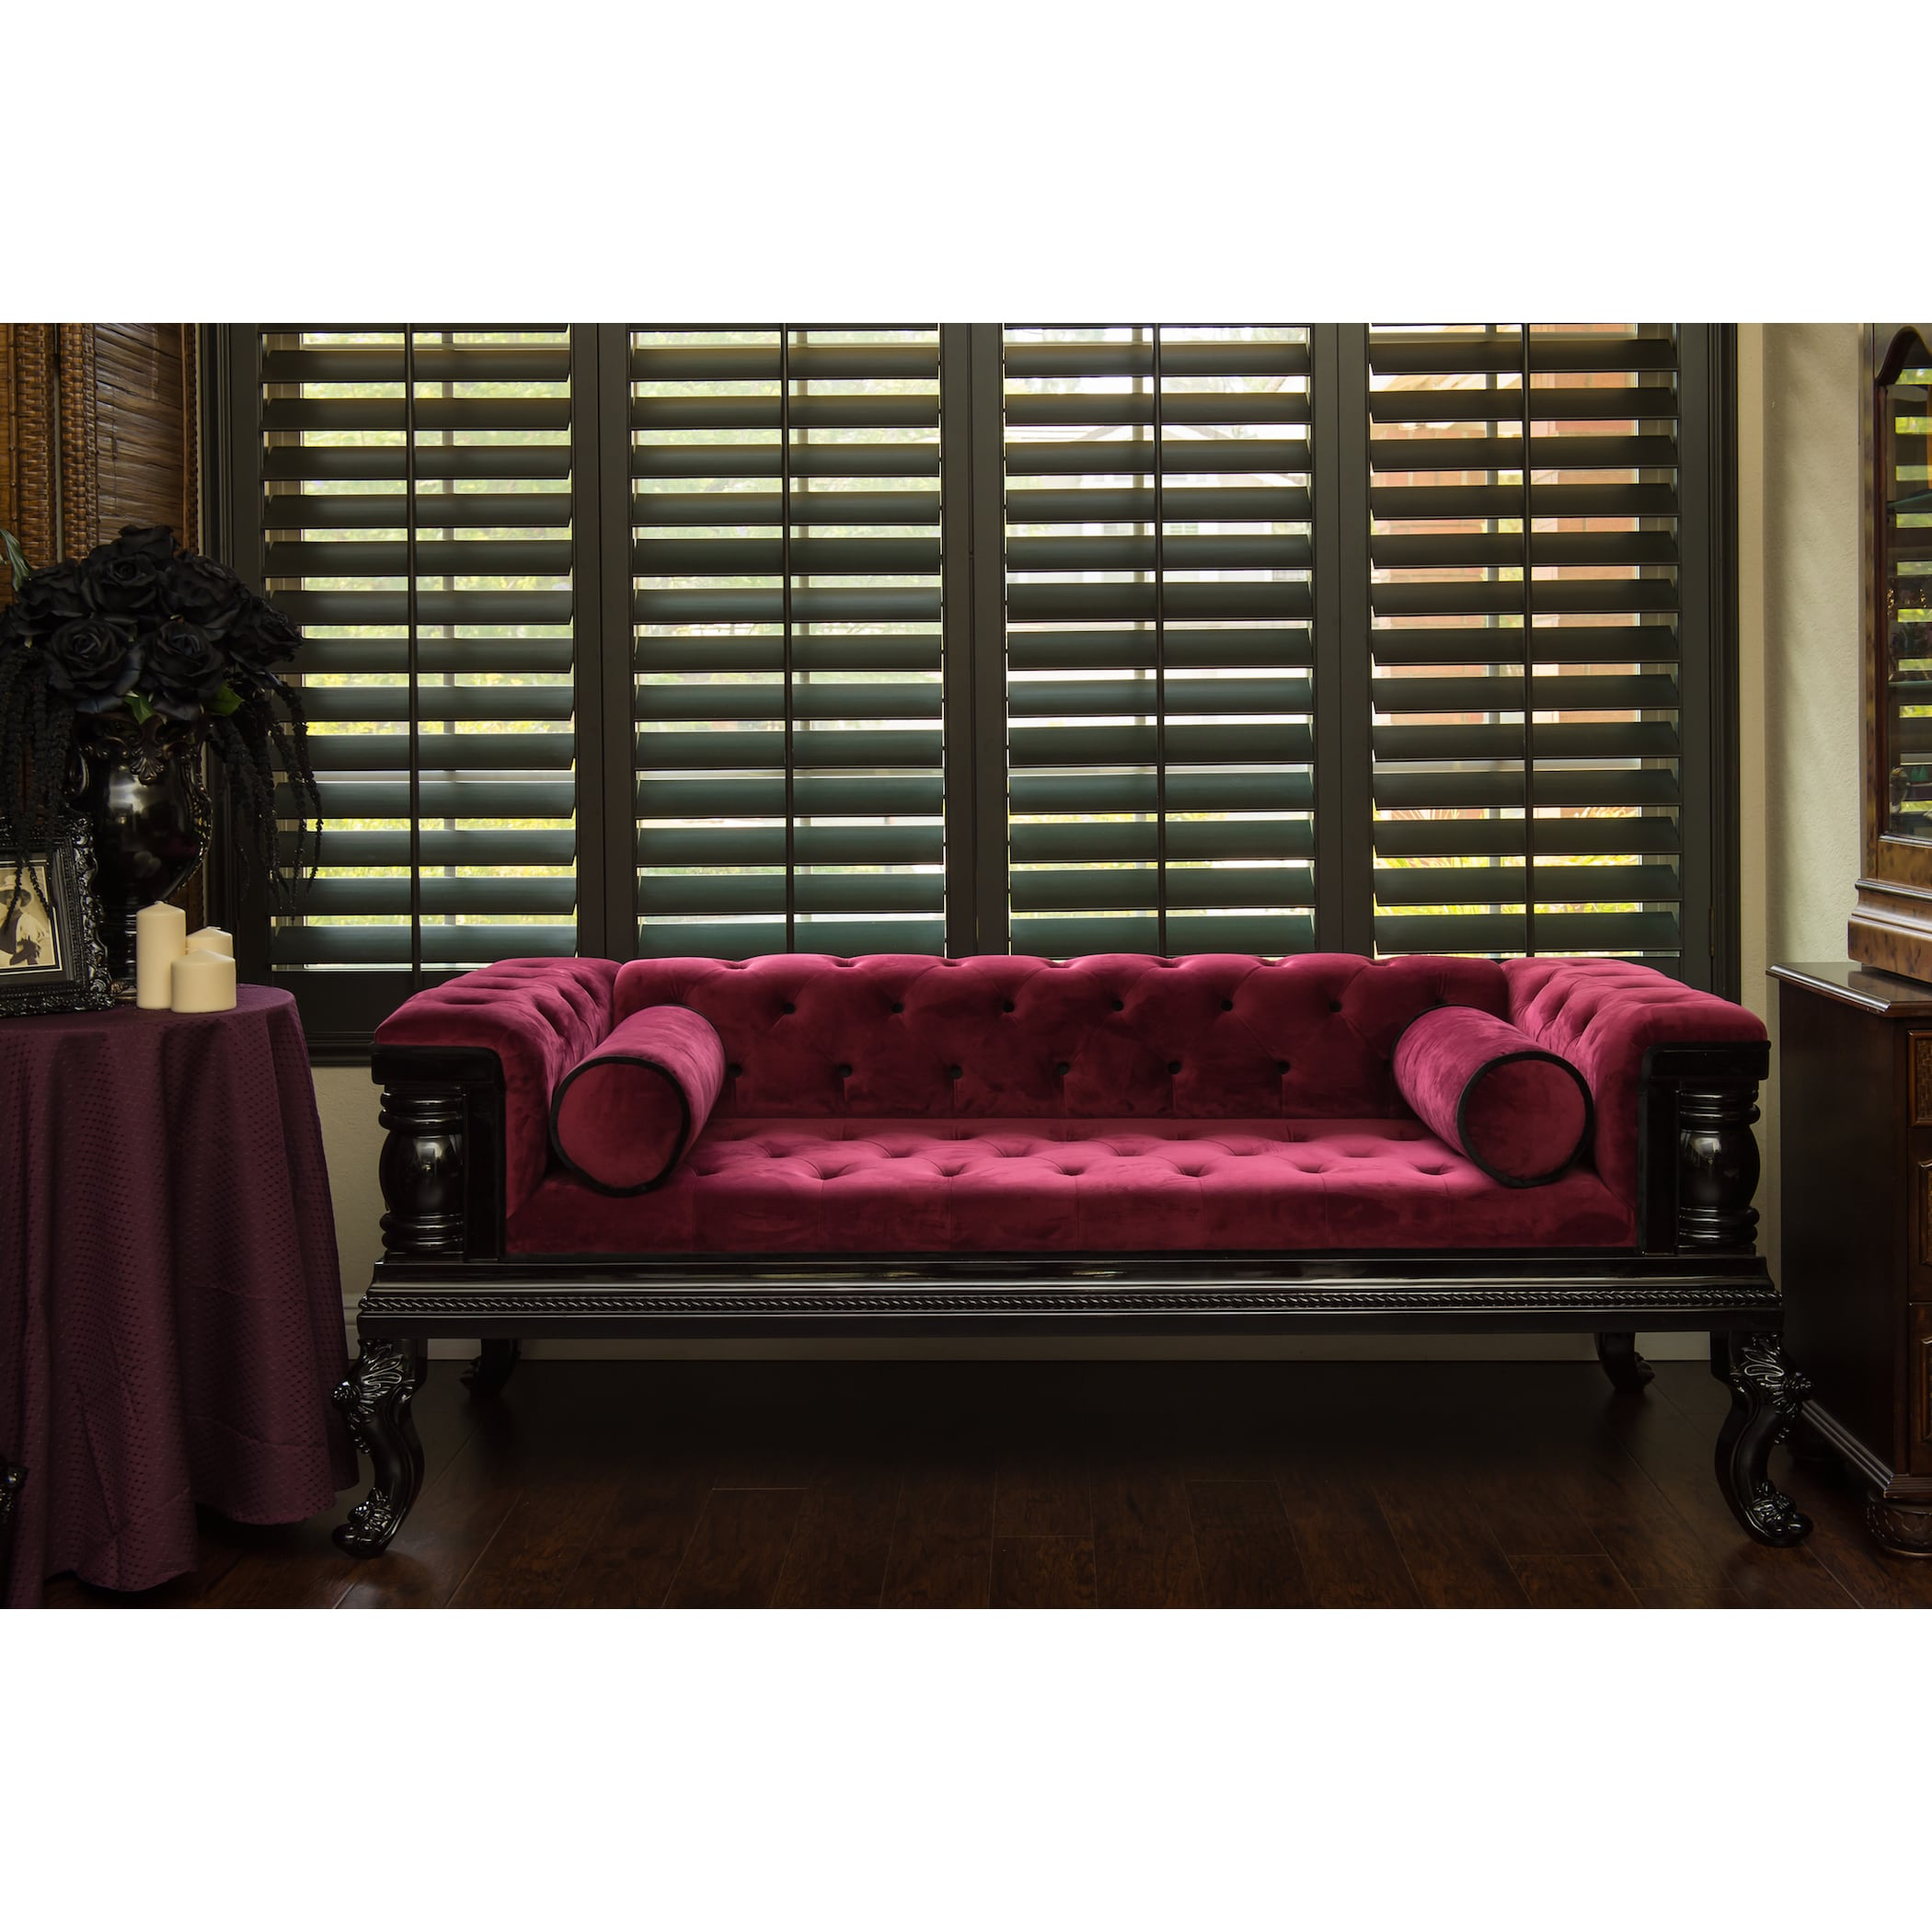 Apex Casket Company Gothic-Inspired Tufted Red Velvet Sofa - Walmart.com